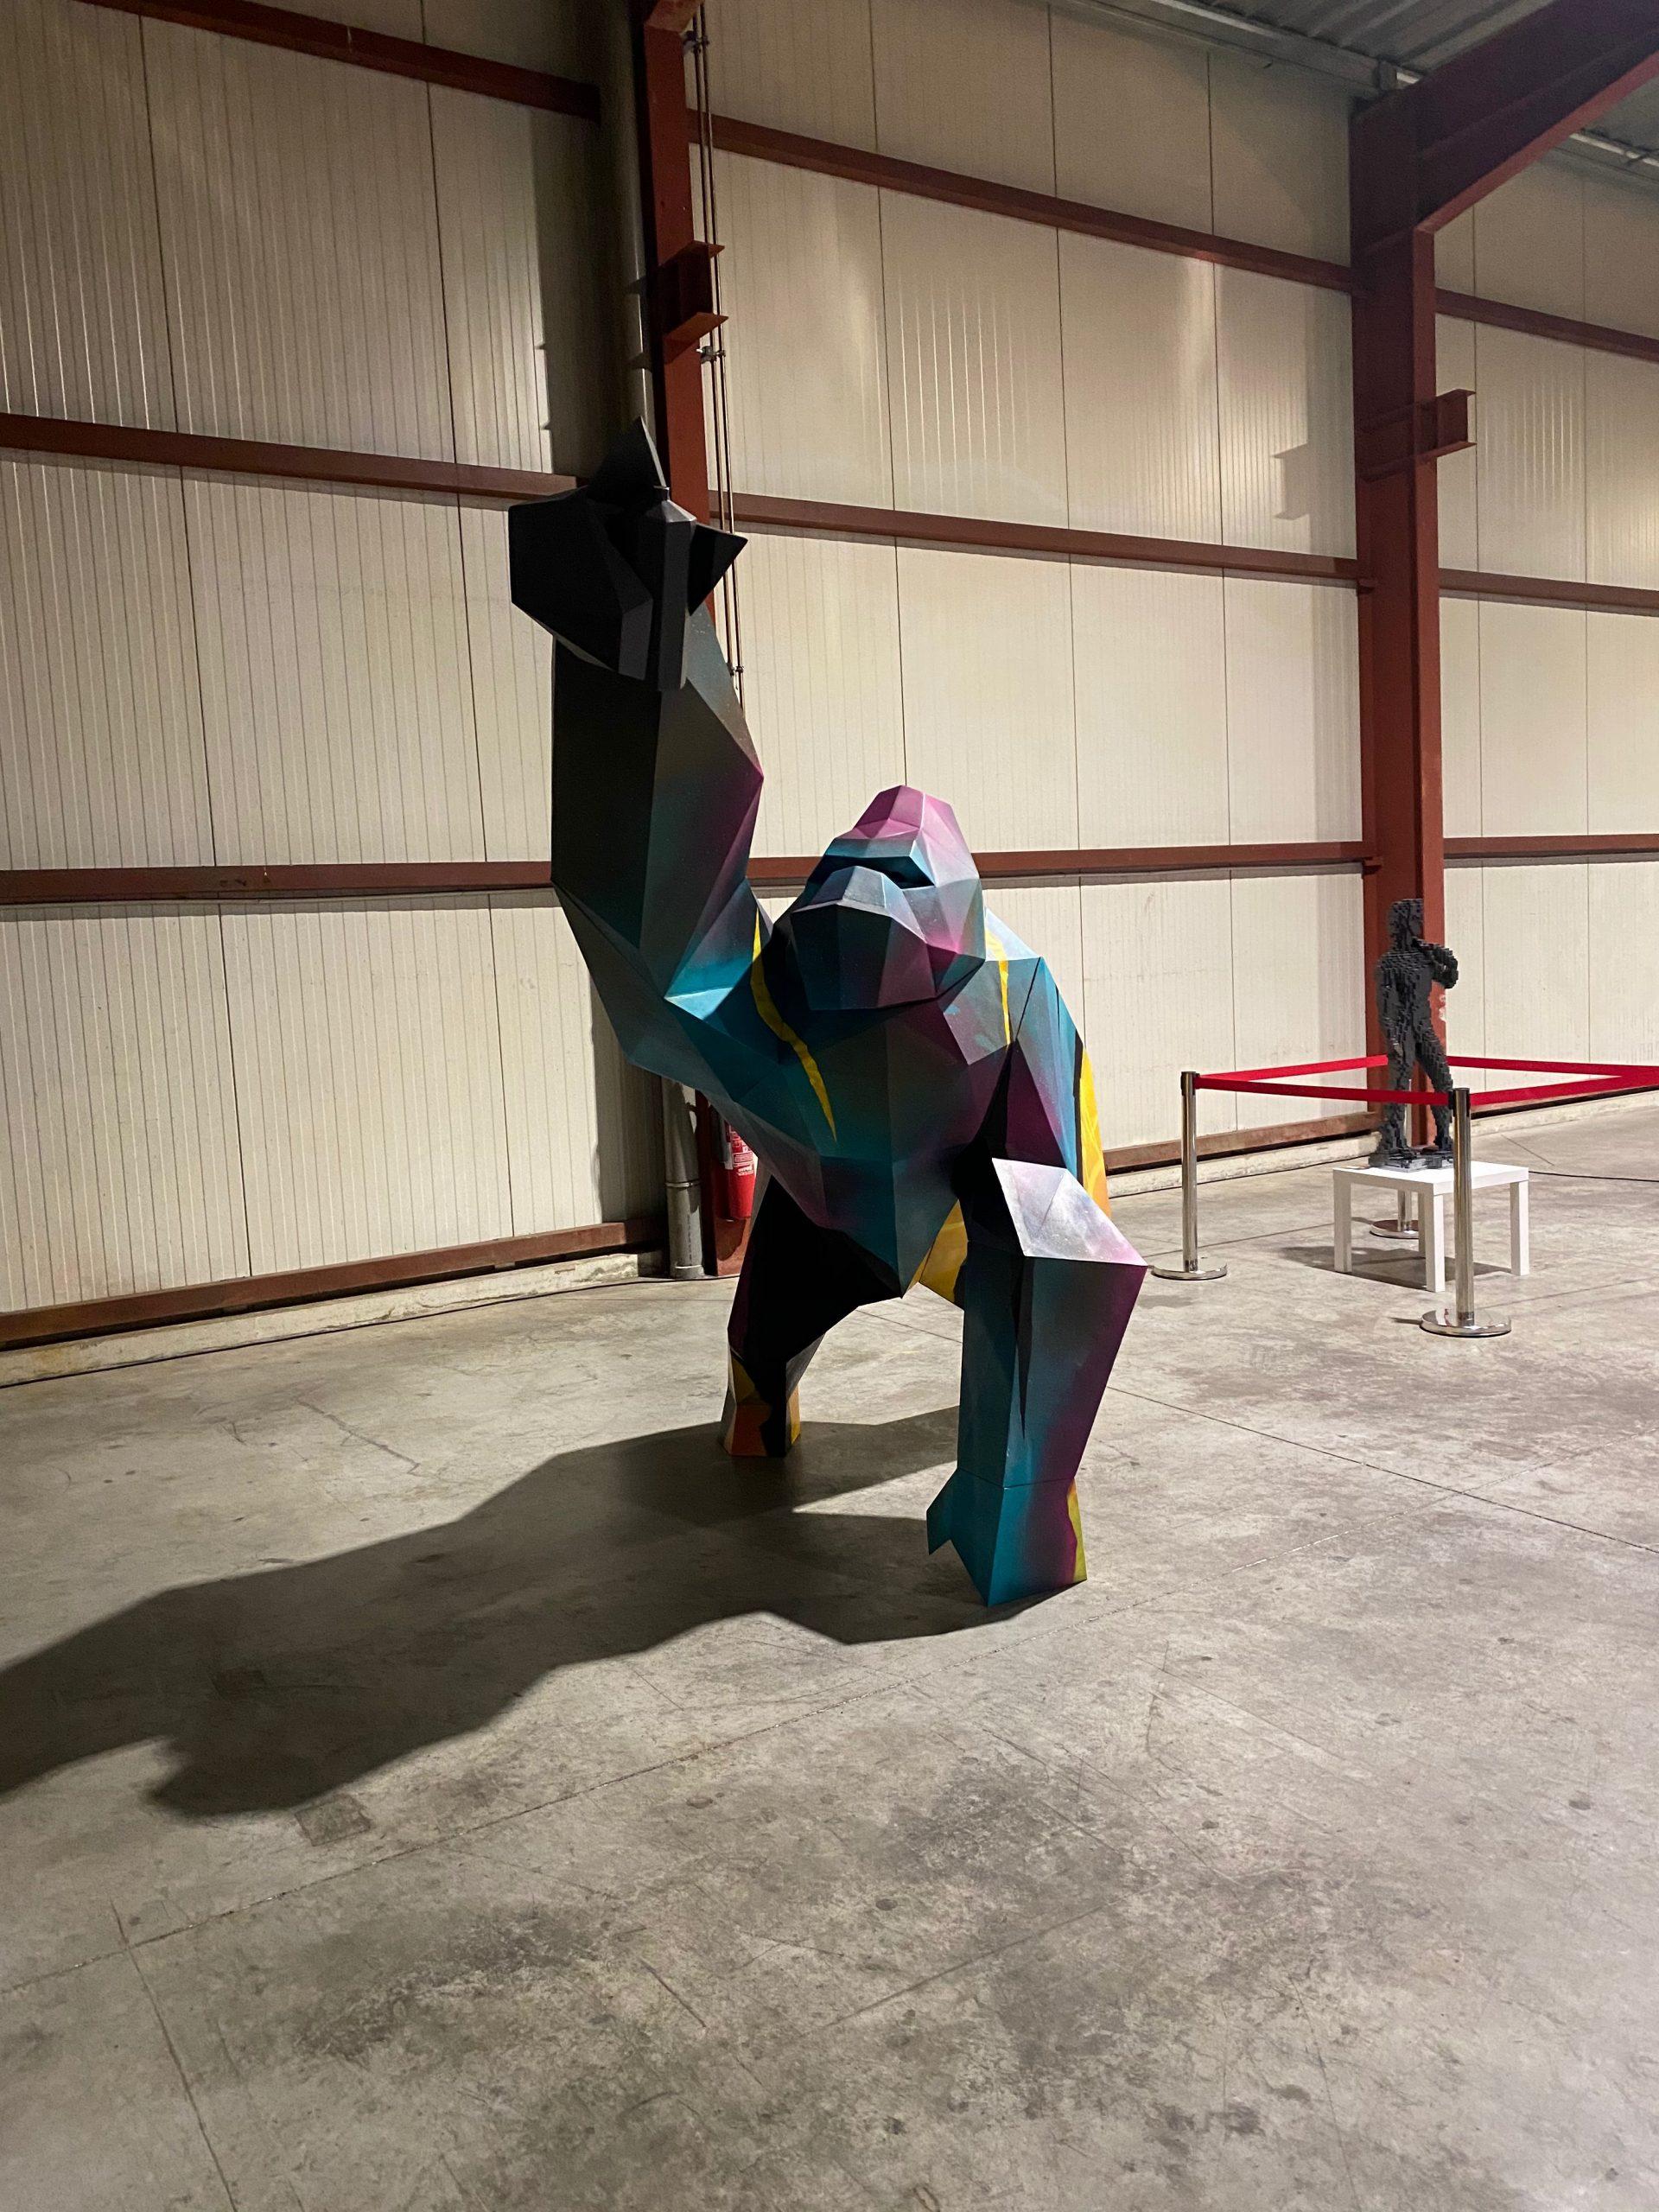 statue gorille thermolaqué multi couleurs, Thermolaq82